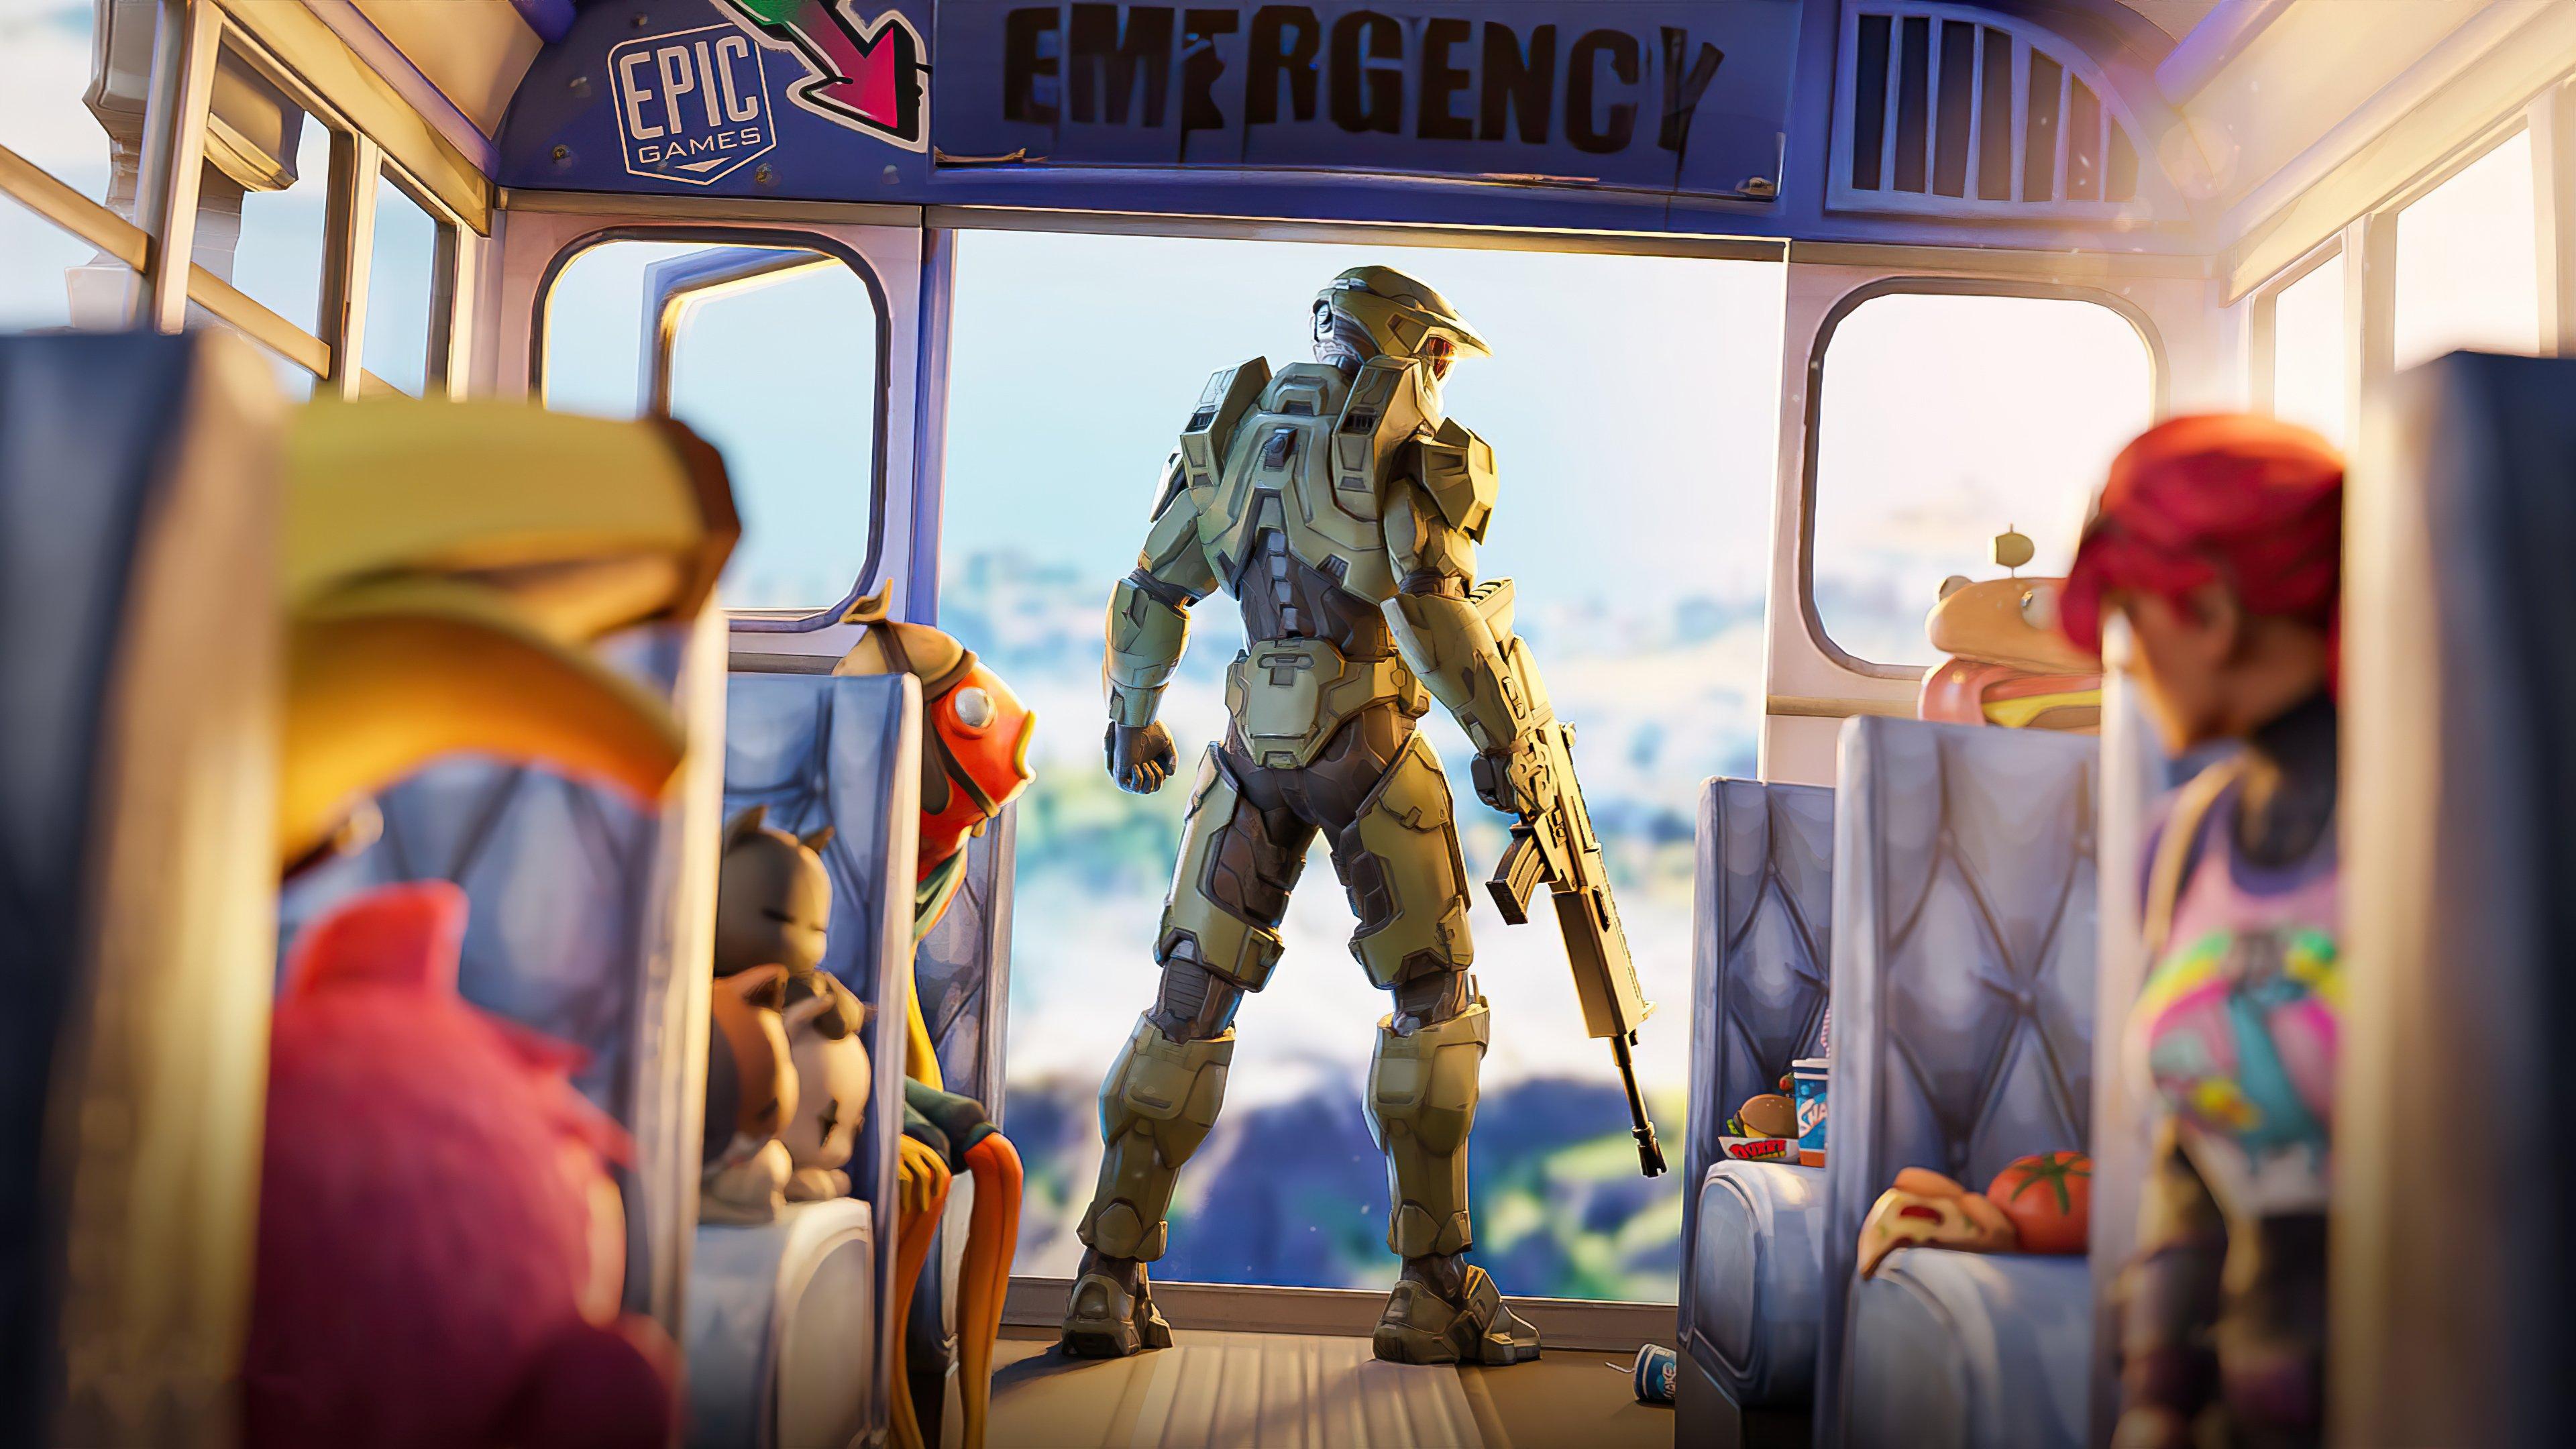 Fondos de pantalla Halo Chief Fortnite